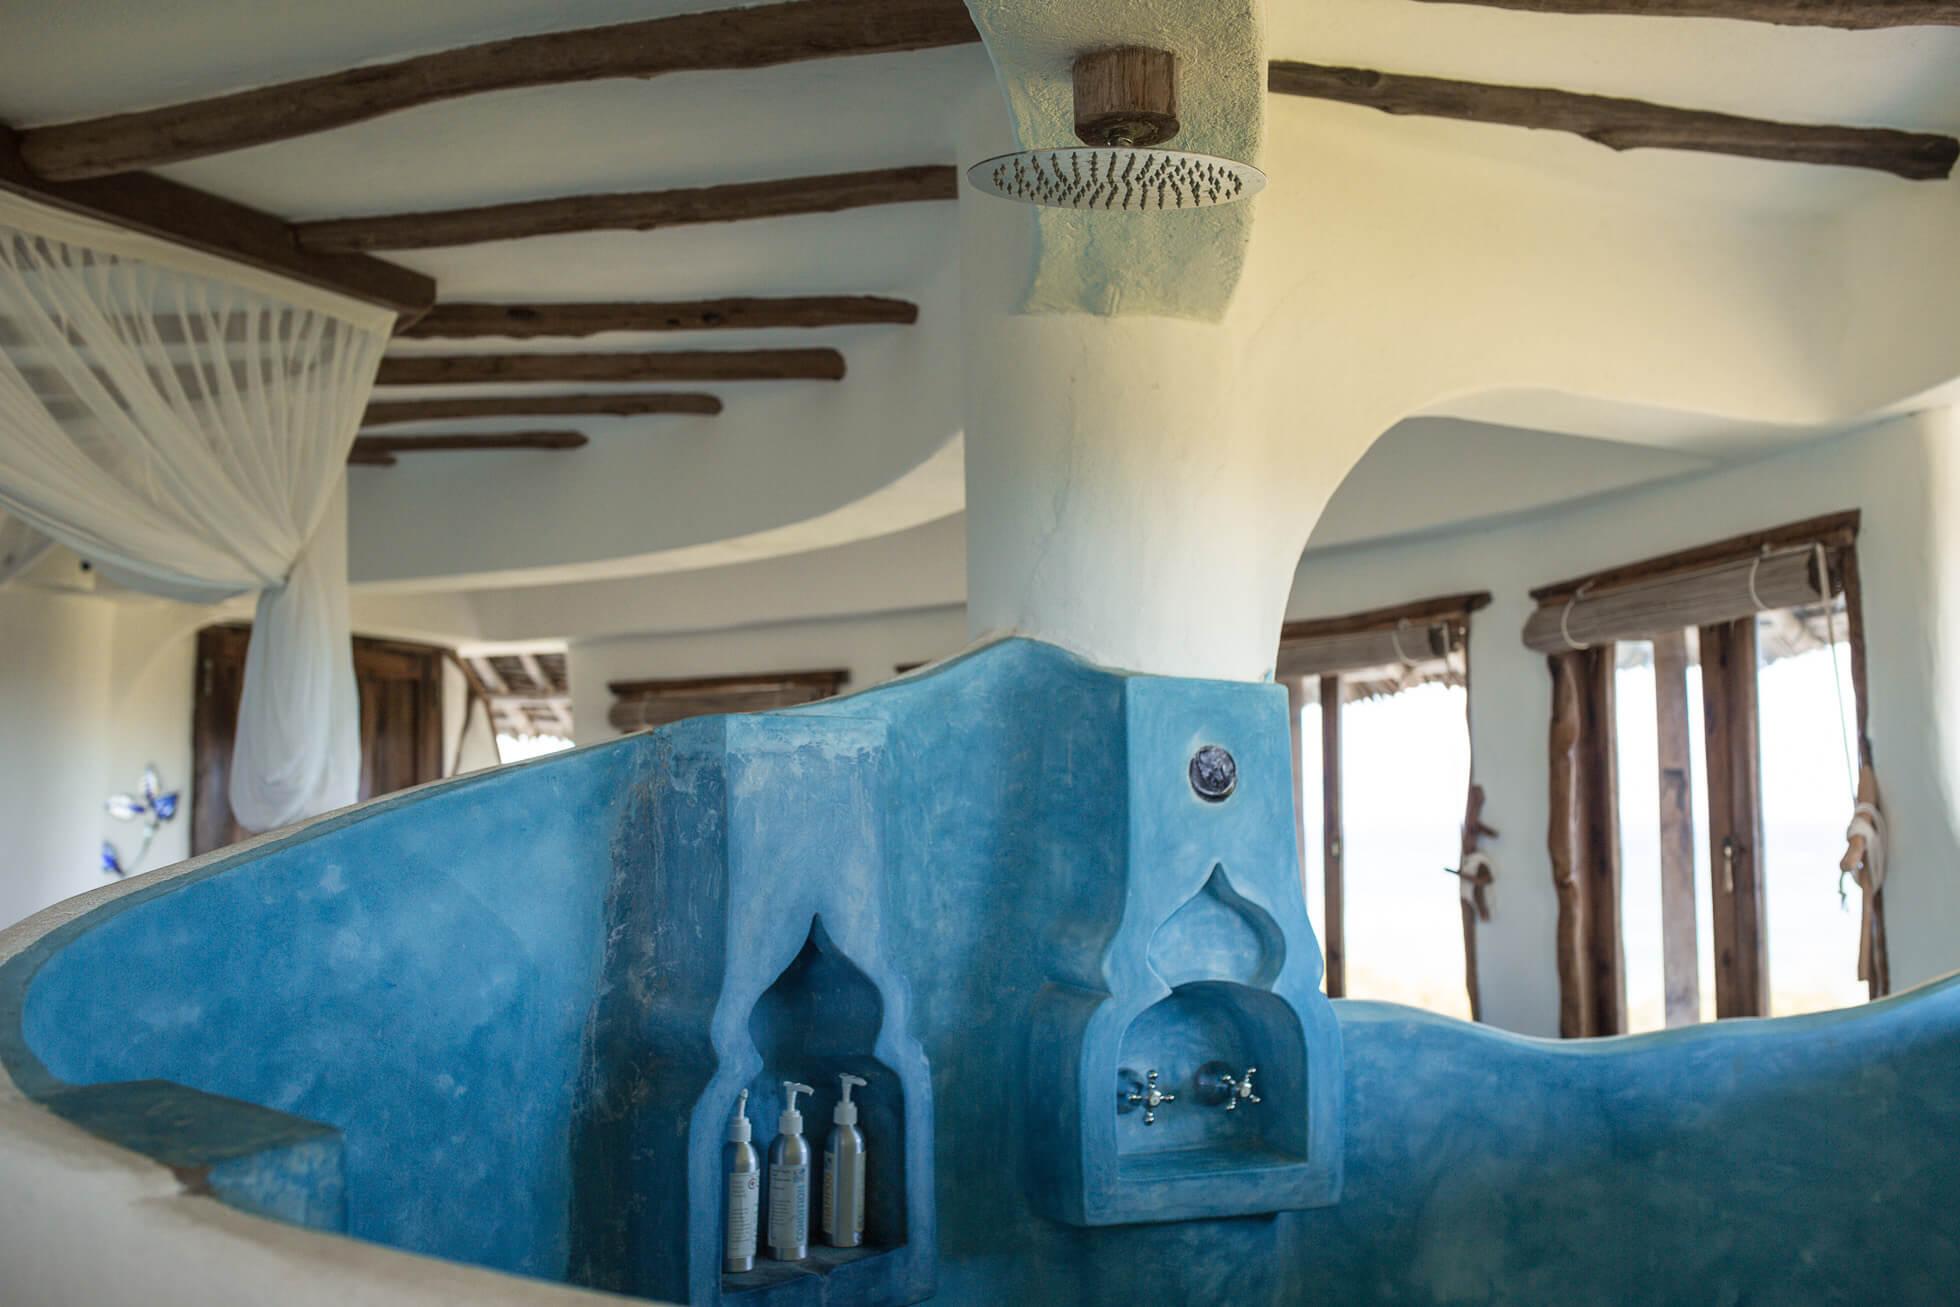 Post-safari beach days in Watamu, Kenya | Where's Mollie? A travel and adventure lifestyle blog